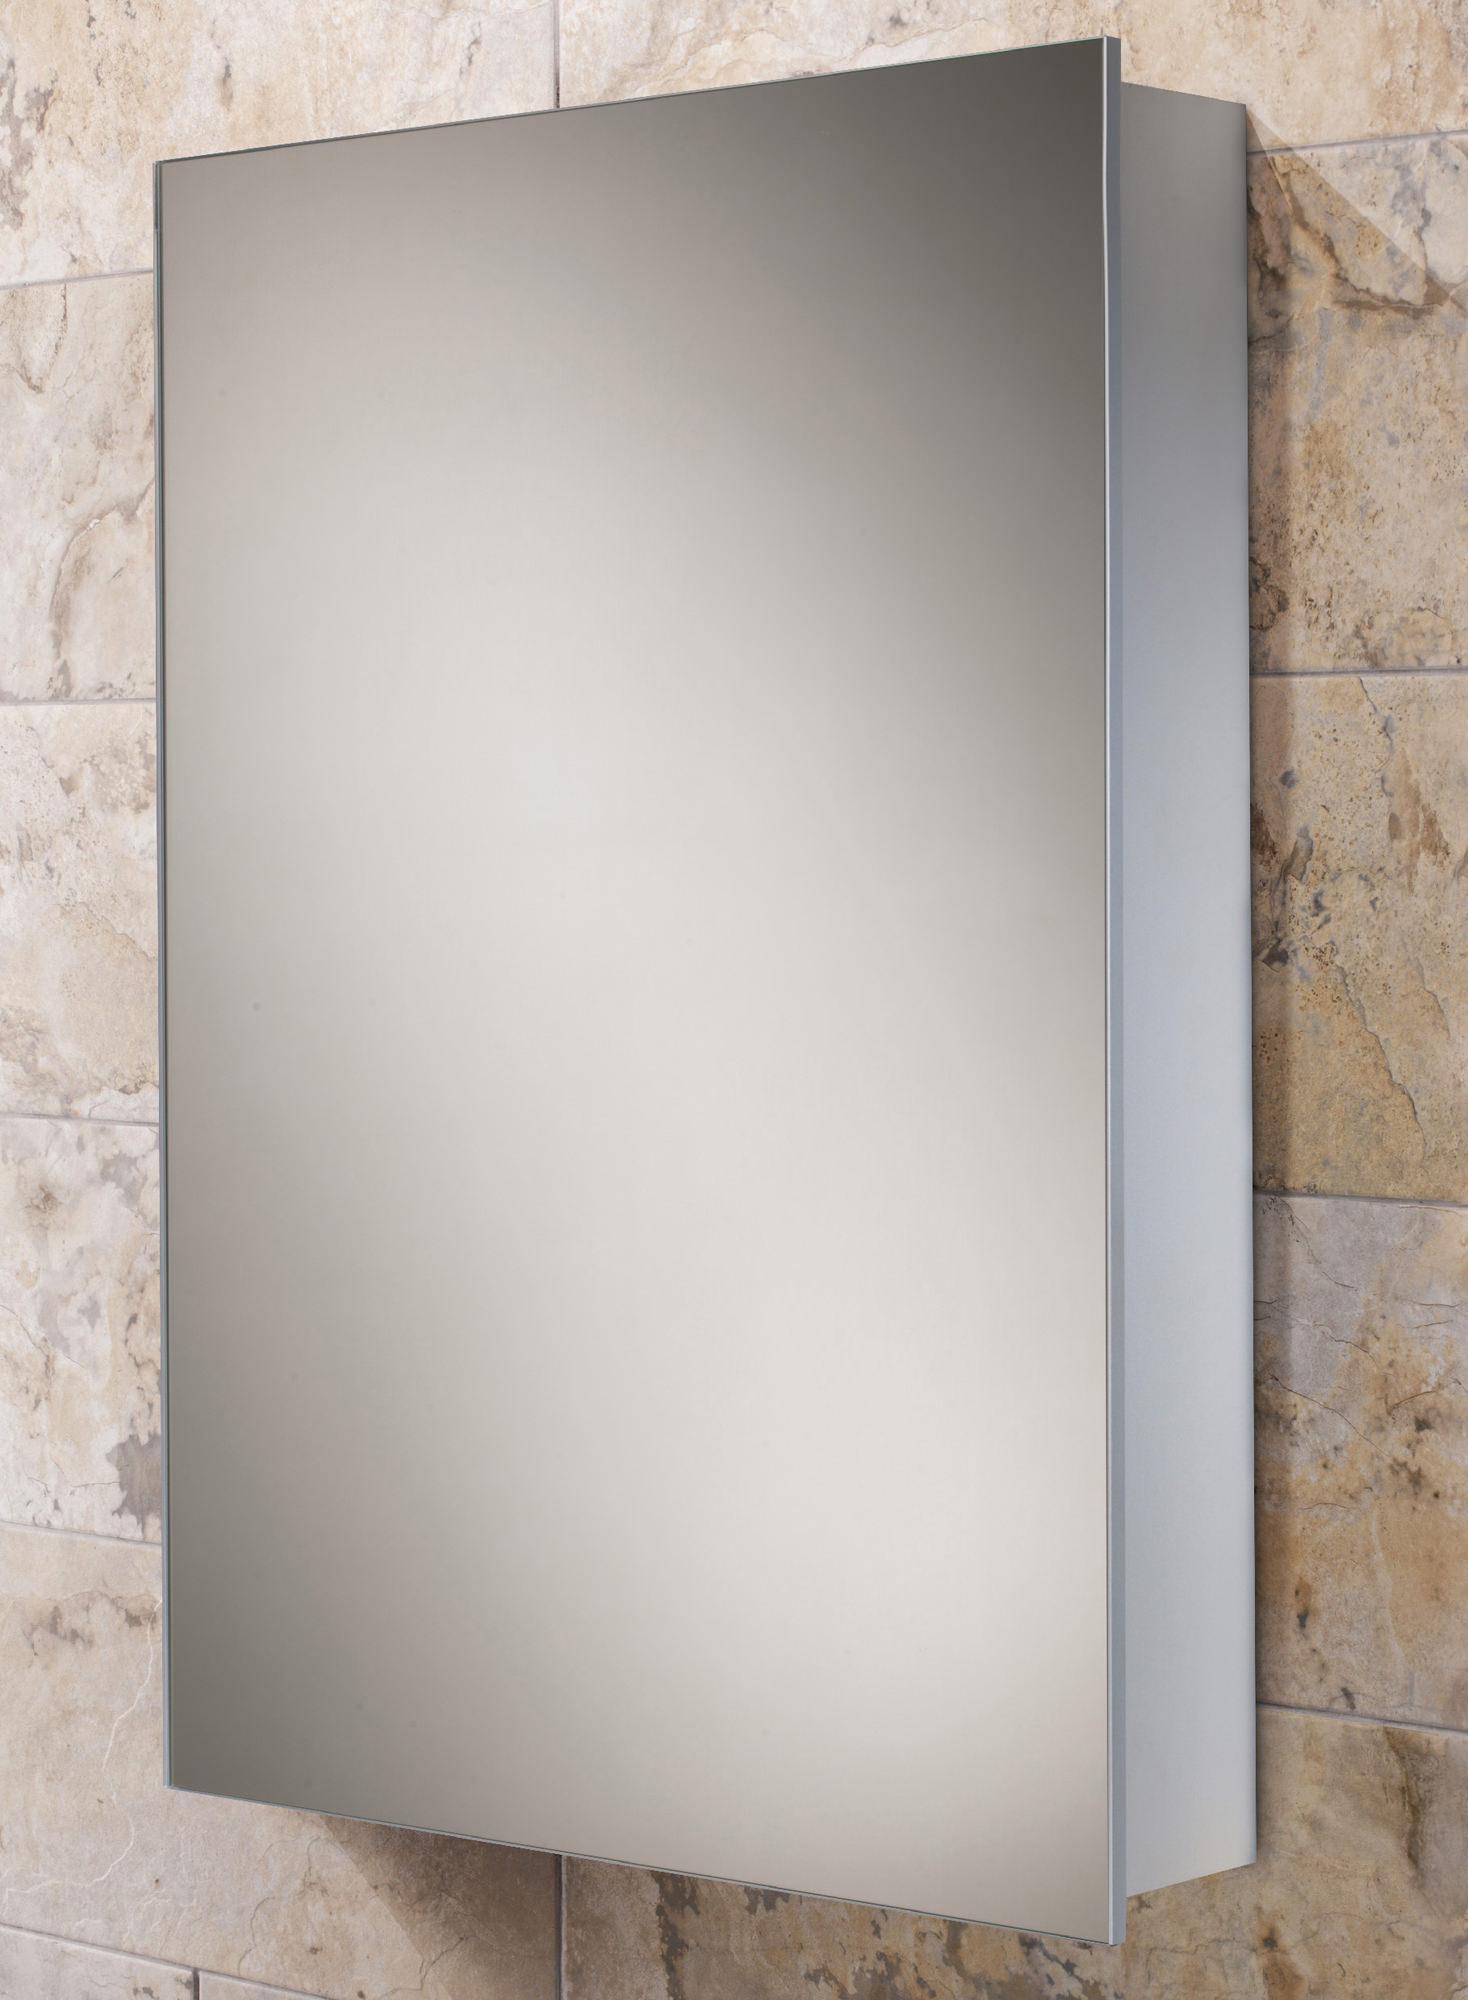 Aluminium Bathroom Cabinets Kore Slim Line Aluminium Bathroom Cabinet 400 X 600mm